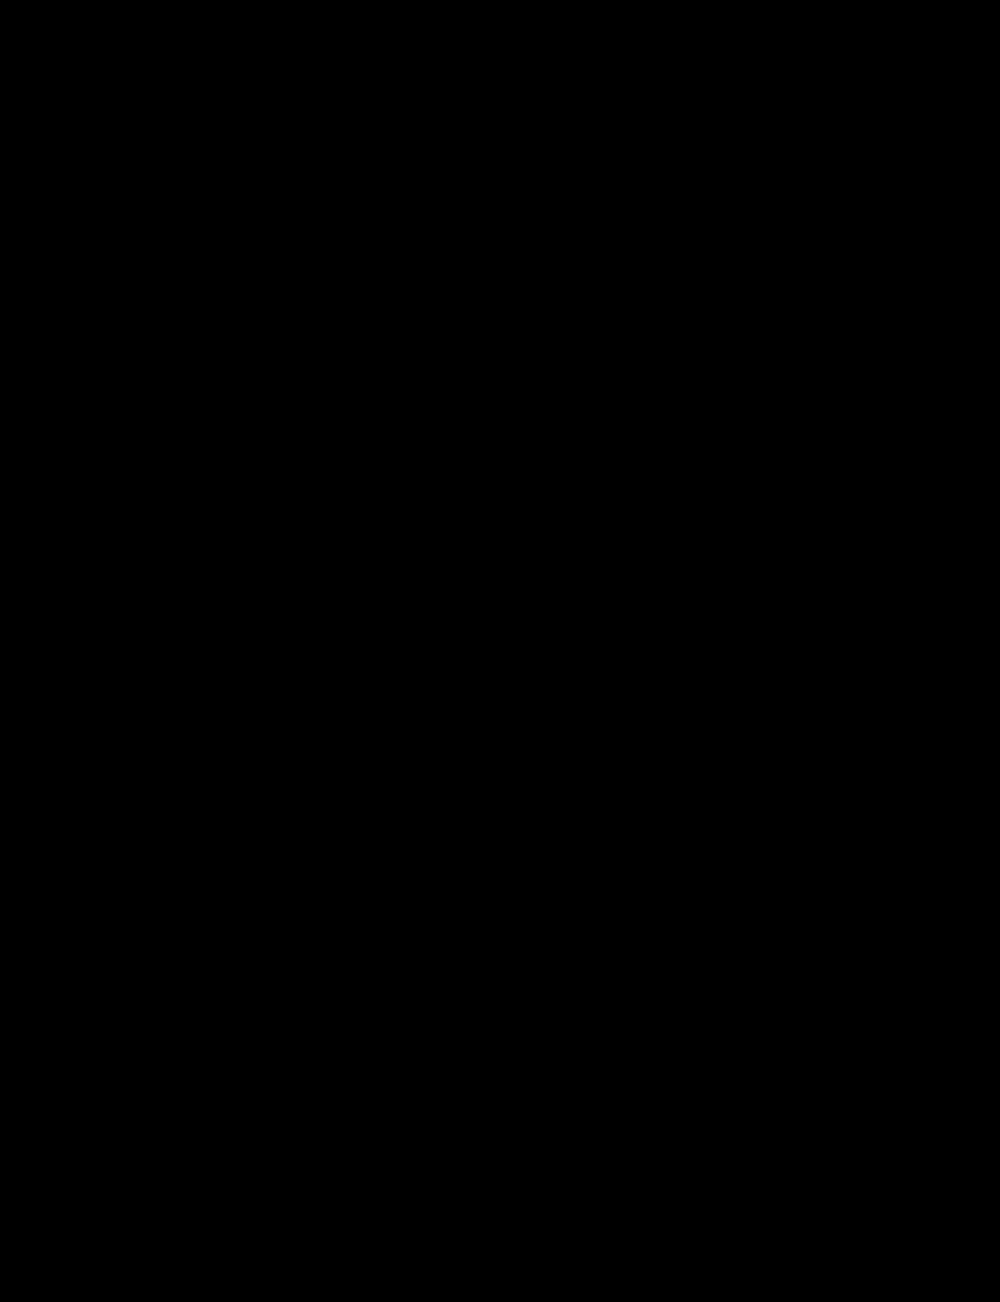 Un mi-long rétro